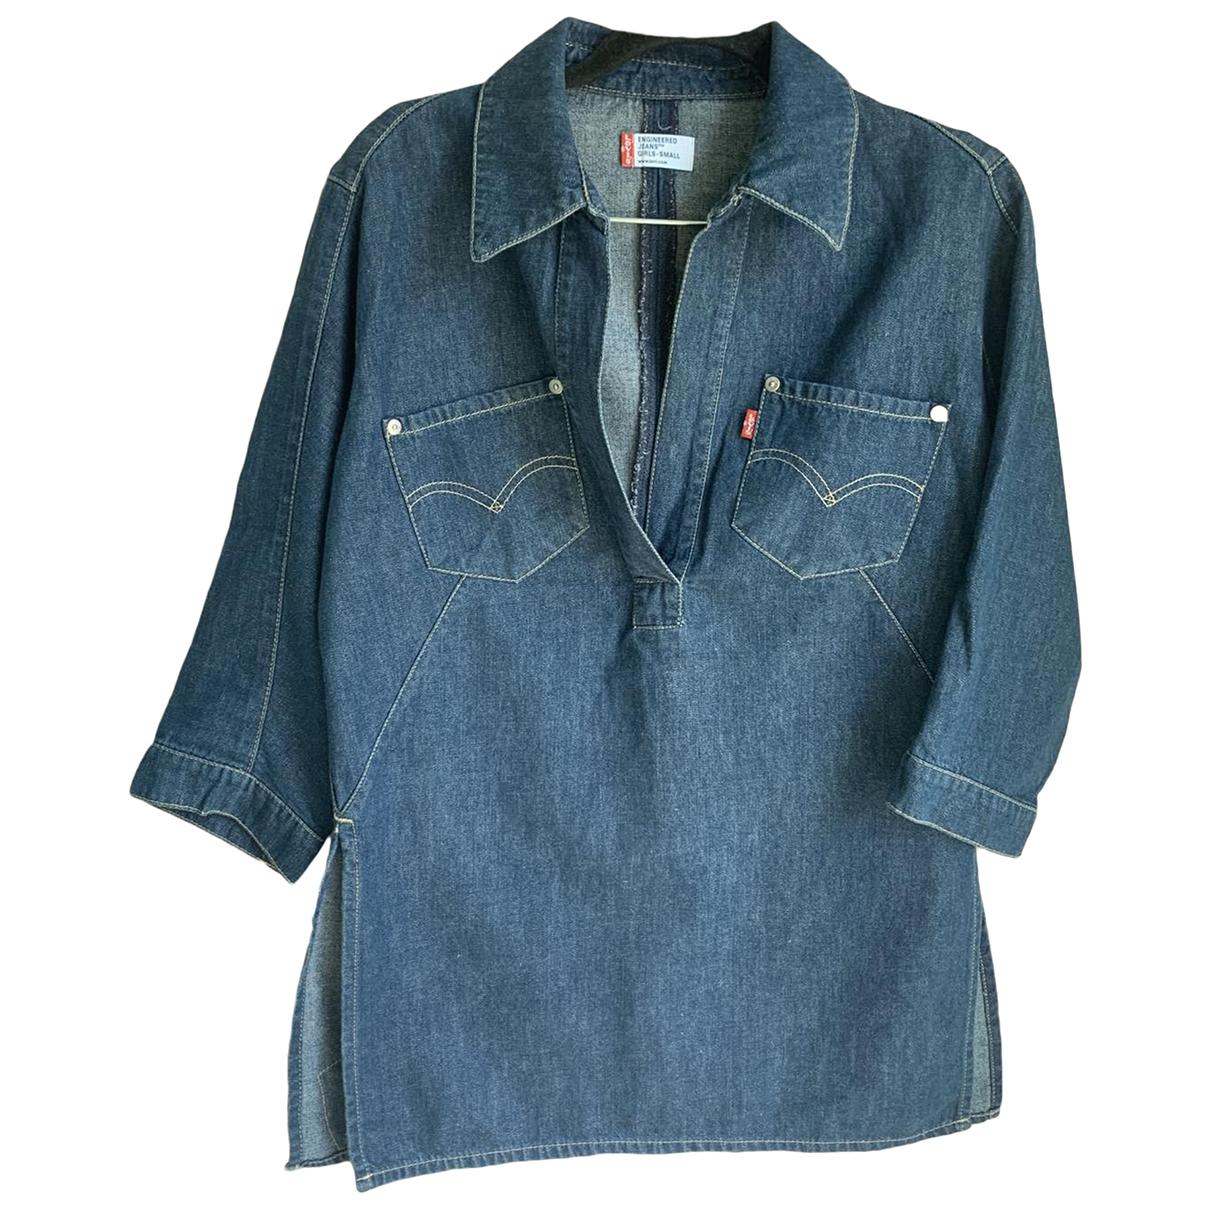 Levi's \N Blue Denim - Jeans  top for Women S International